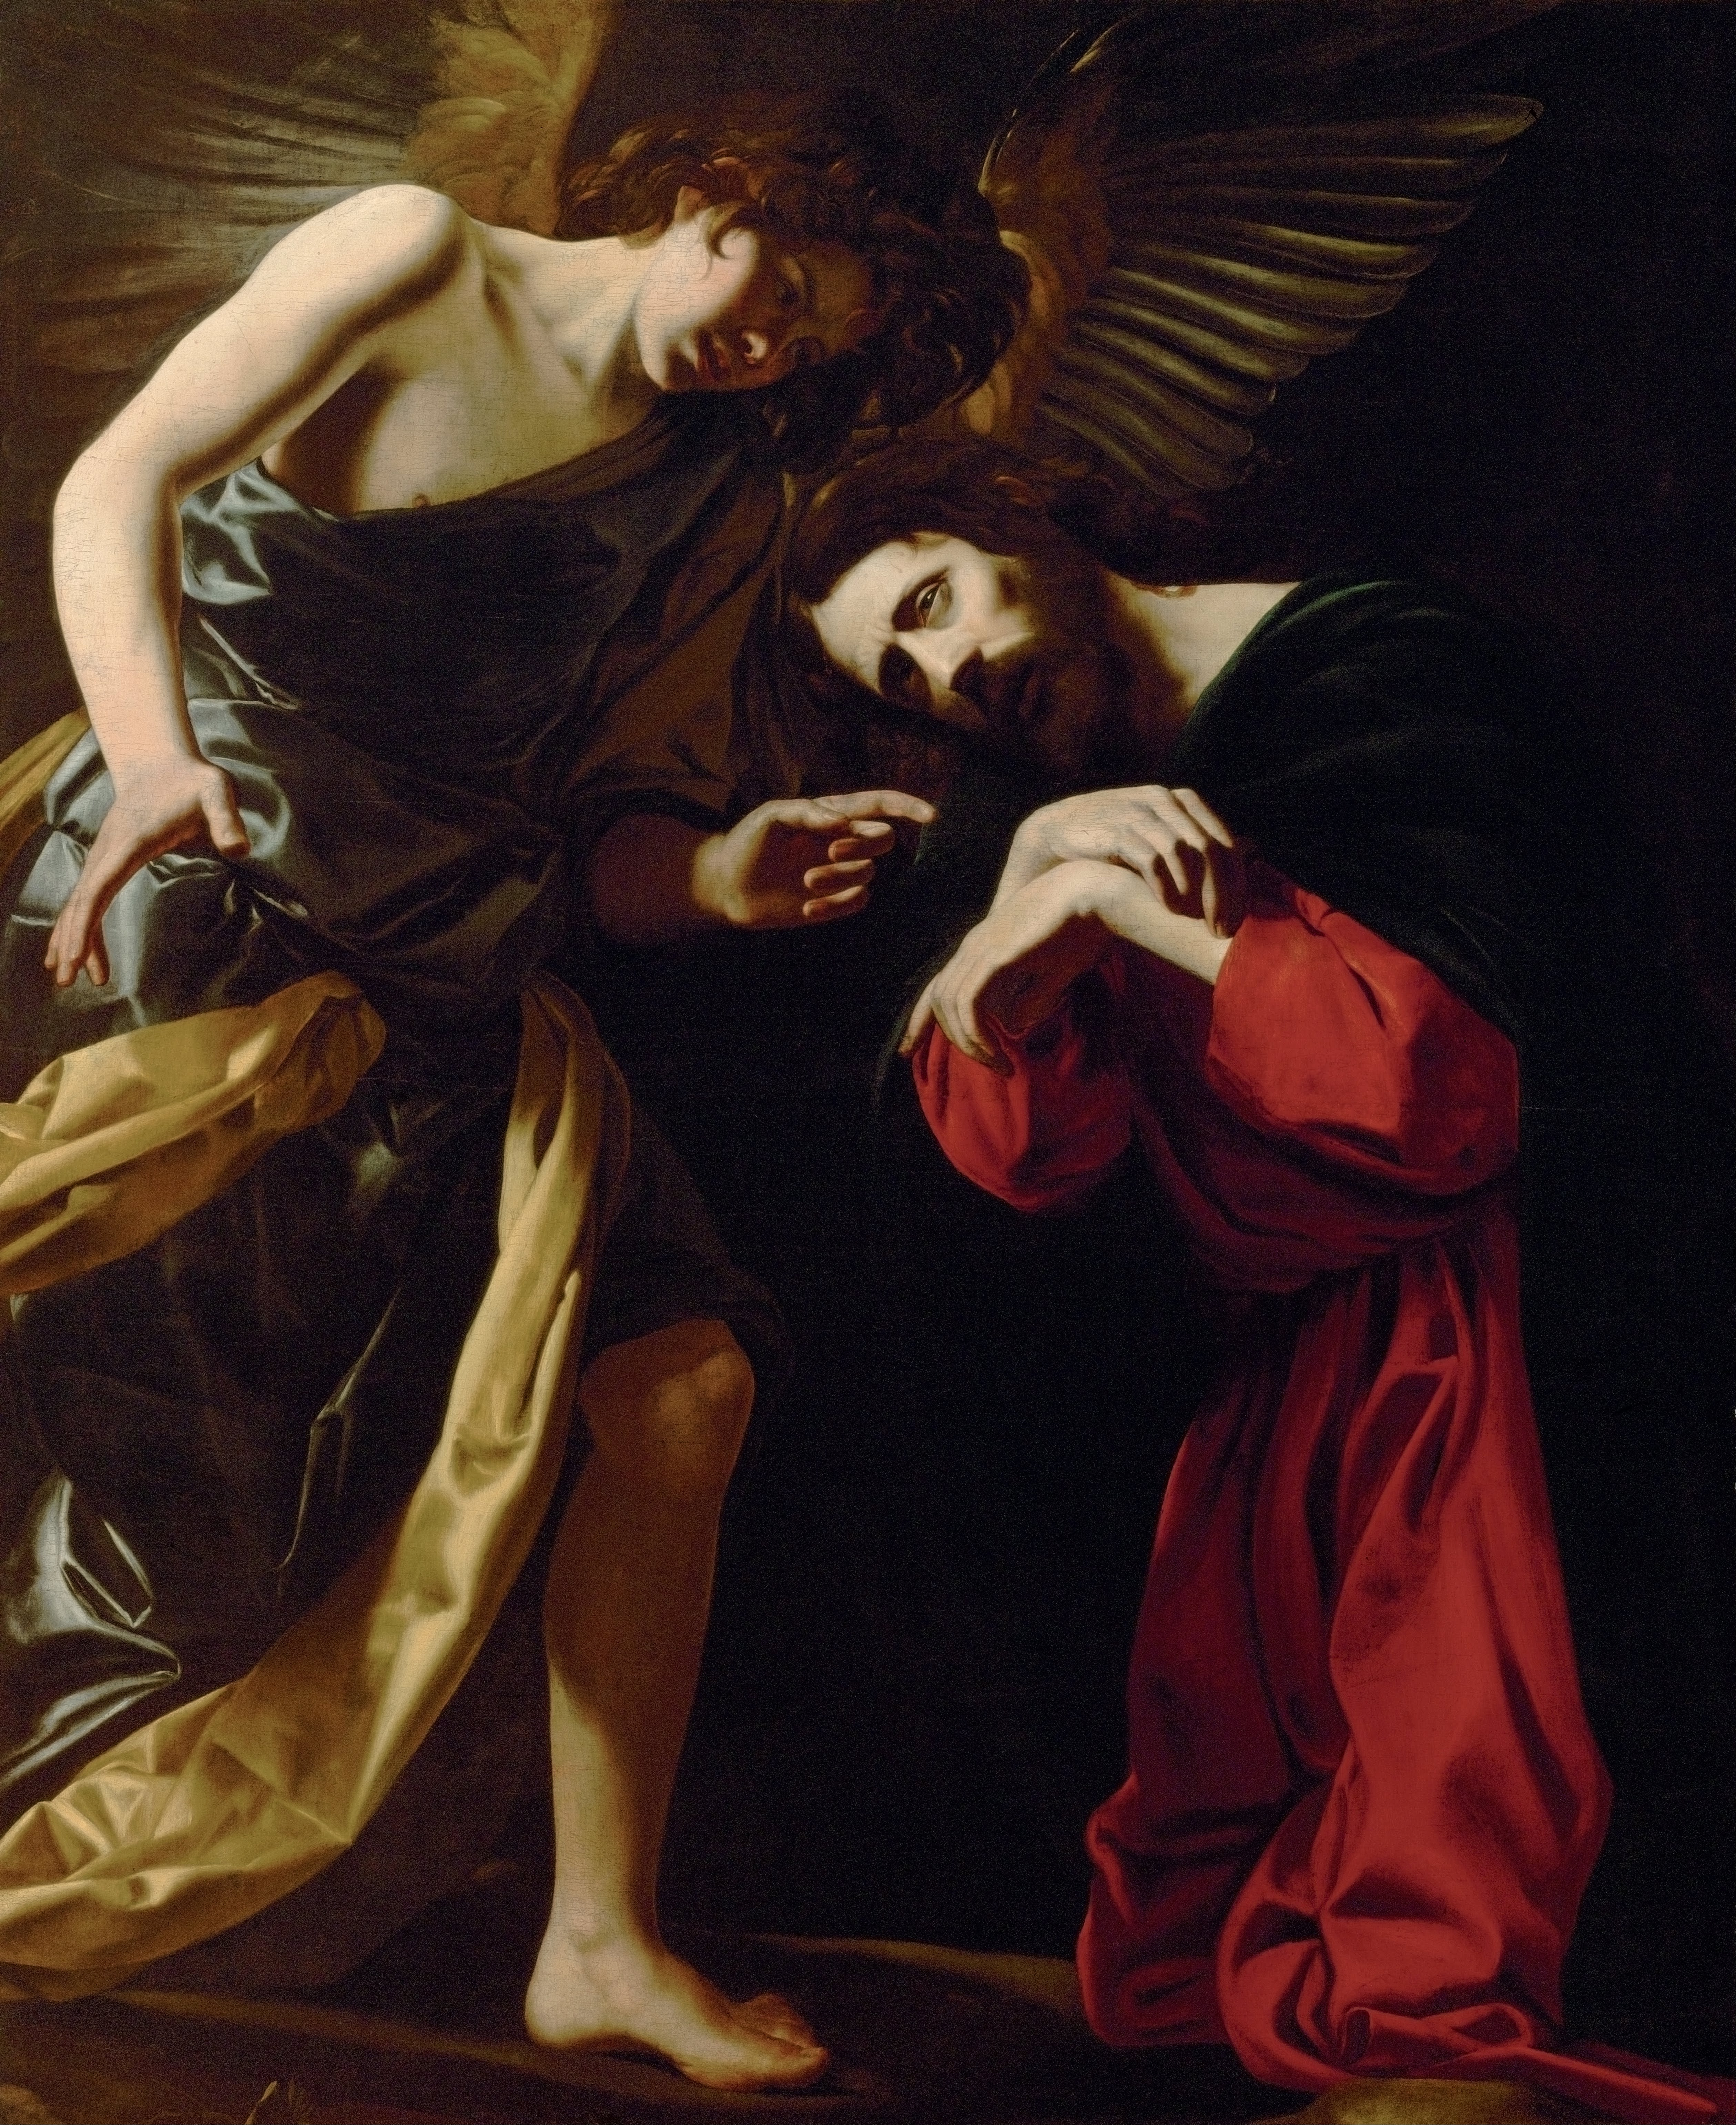 File:Giovanni Battista Caracciolo, called Battistello - Christ on the ...: http://commons.wikimedia.org/wiki/File:Giovanni_Battista_Caracciolo,_called_Battistello_-_Christ_on_the_Mount_of_Olives_(Christ%E2%80%99s_Fear_of_Death)_-_Google_Art_Project.jpg